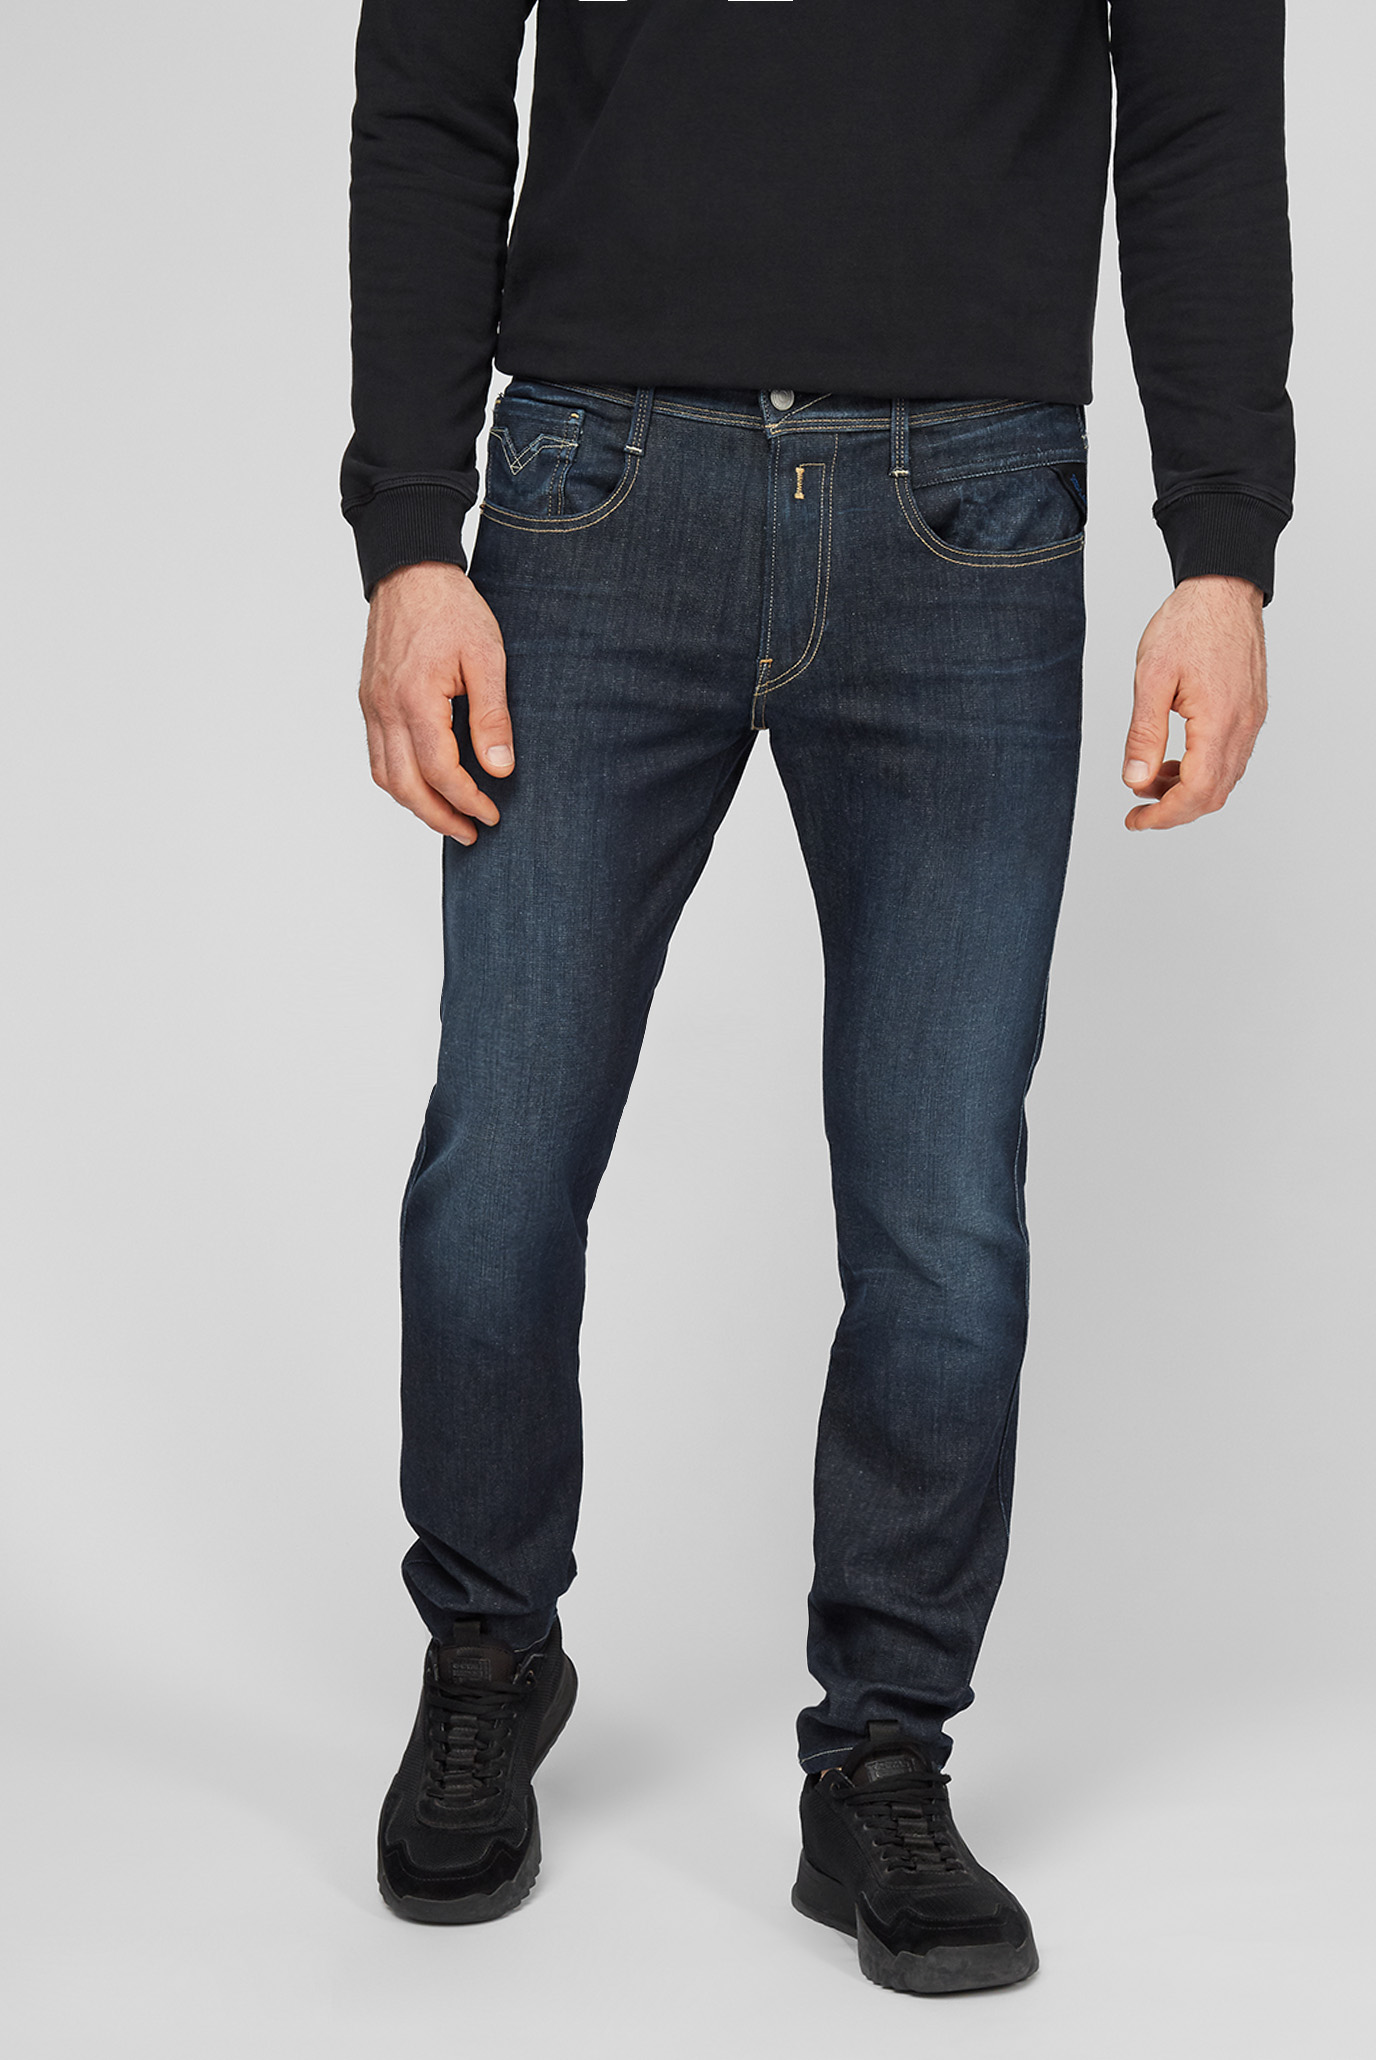 Мужские темно-синие джинсы Hyperflex Anbass 1